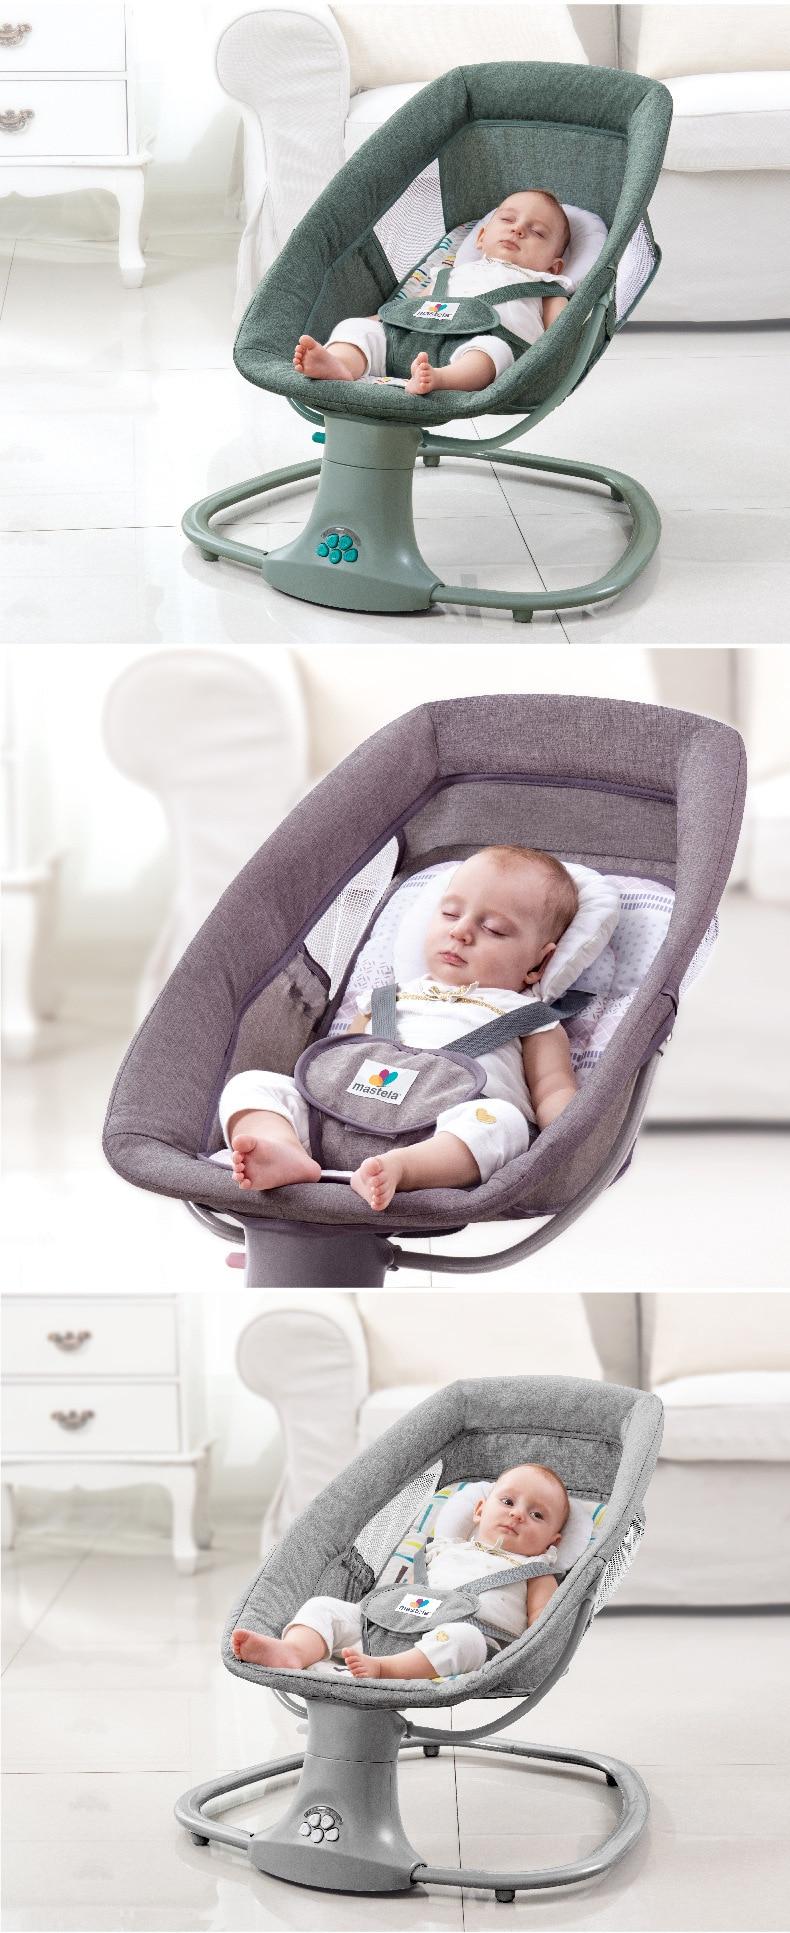 Newborns-Sleeping-Cradle-Bed-Child-comfort-chair-reclining-chair 12